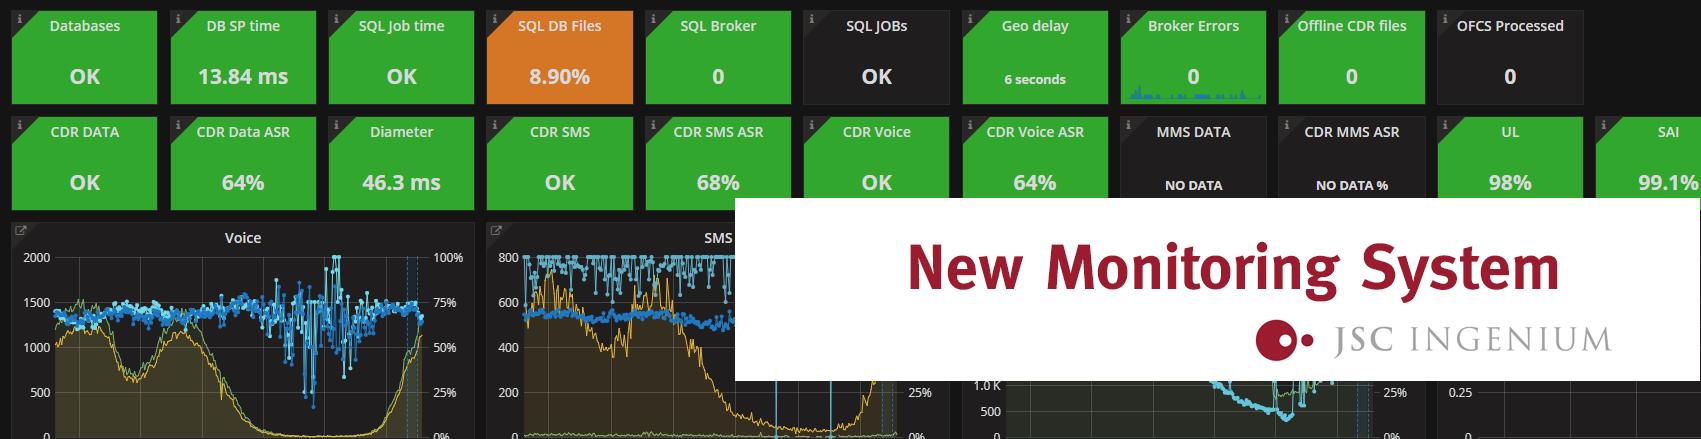 JSC Ingenium: sistema monitorización